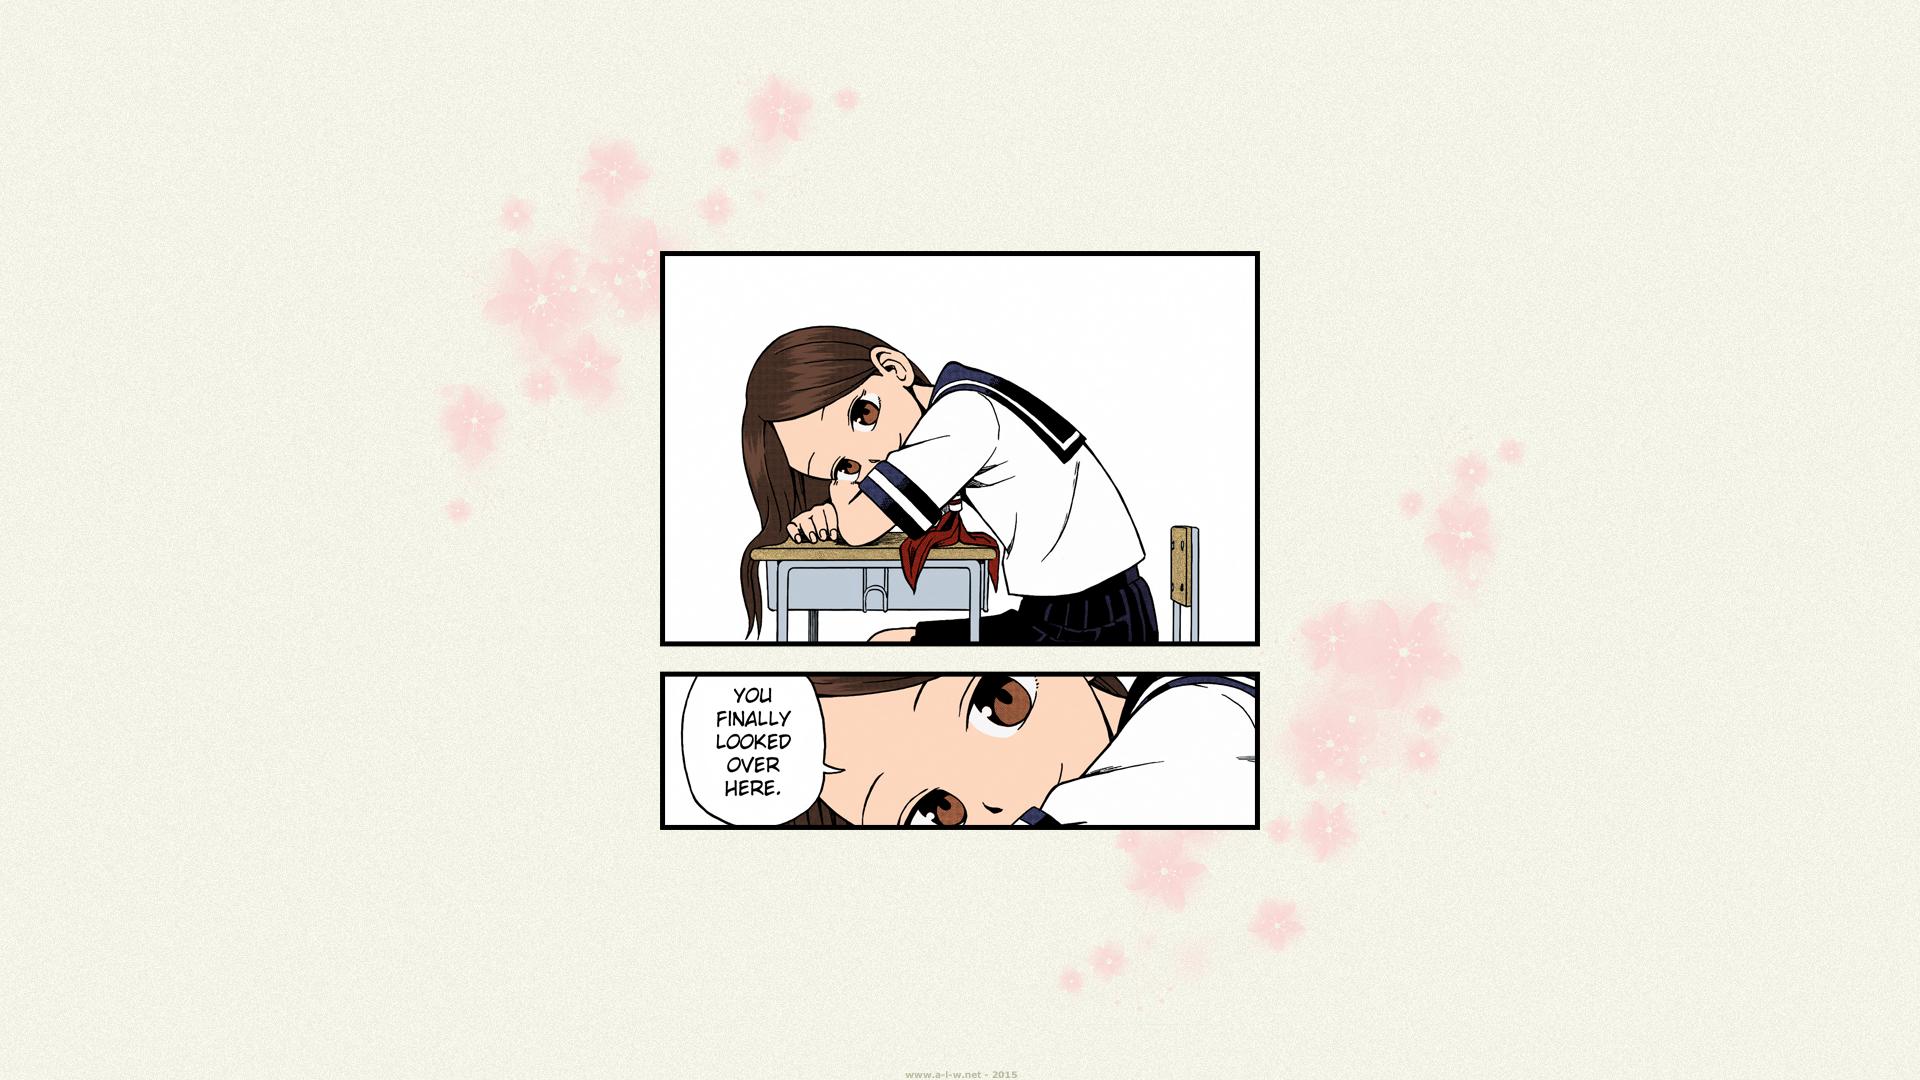 Anime 1920x1080 Karakai Jouzu no Takagi-san Takagi-san school uniform schoolgirl anime girls manga romance love Souichirou Yamamoto